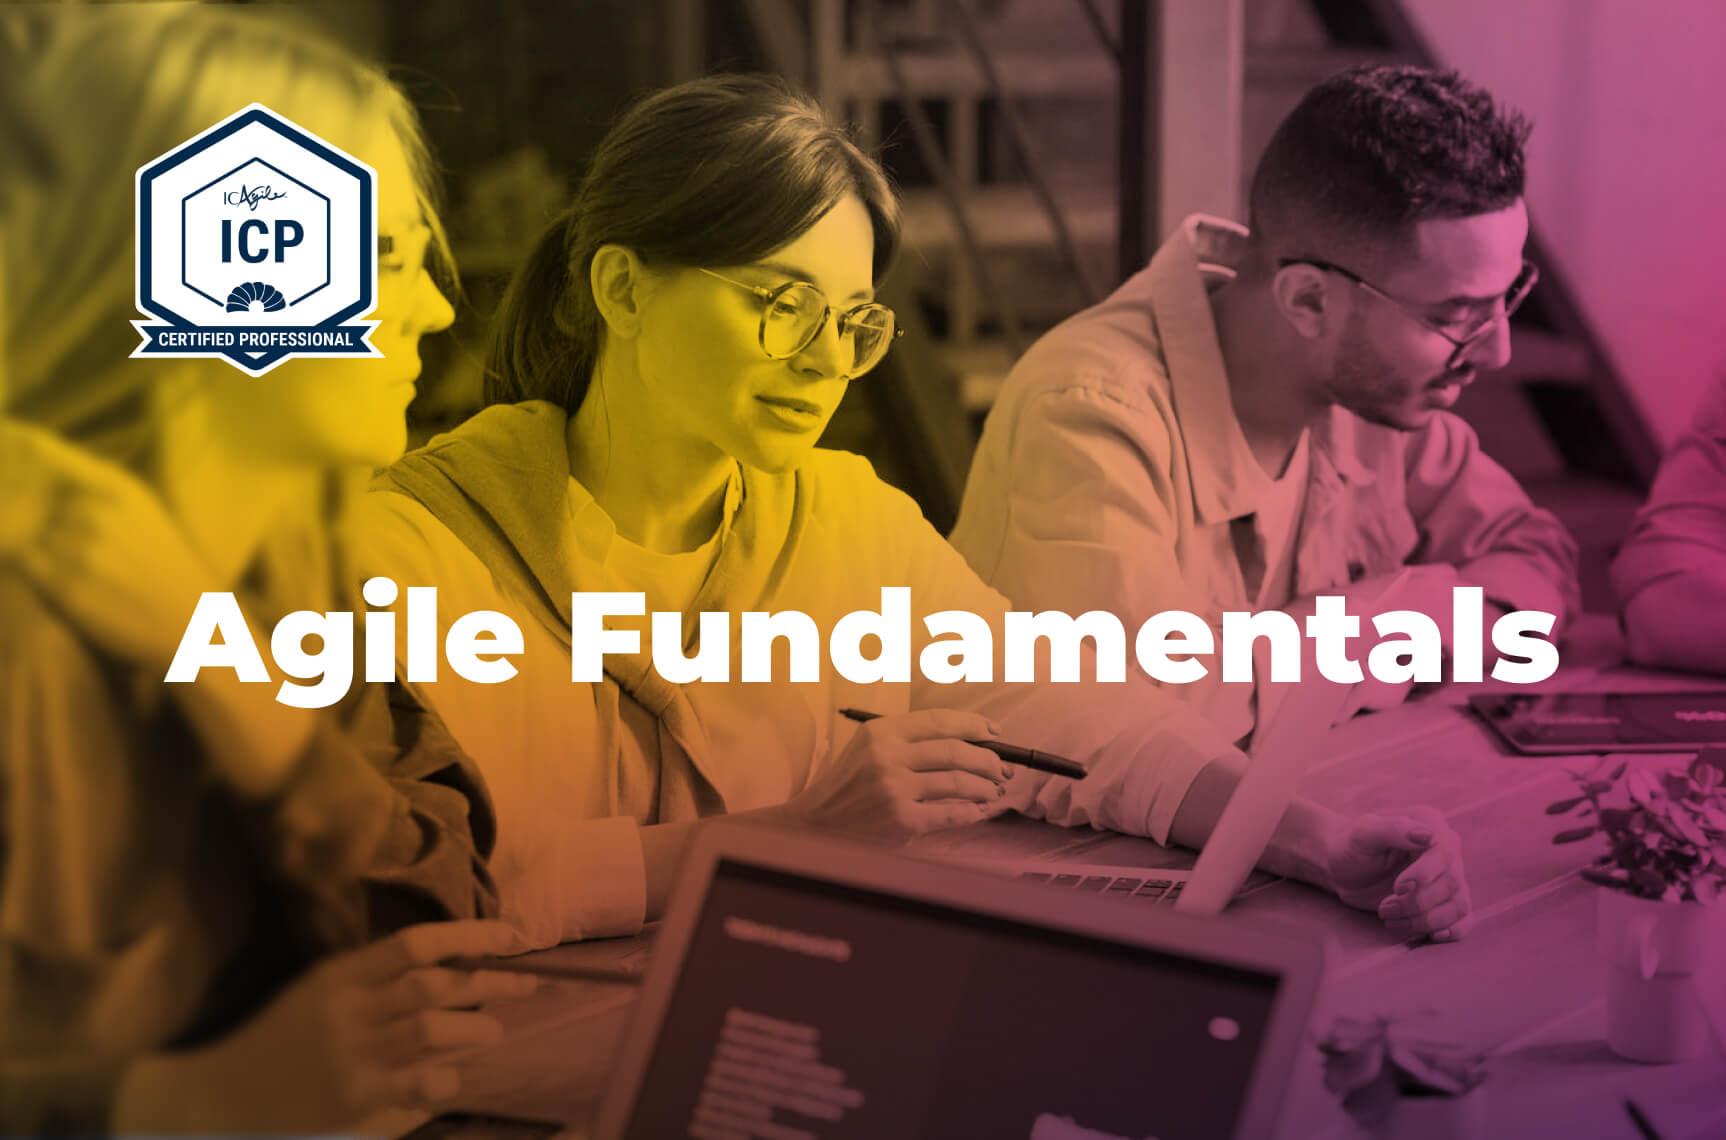 Agile fundamentals online training